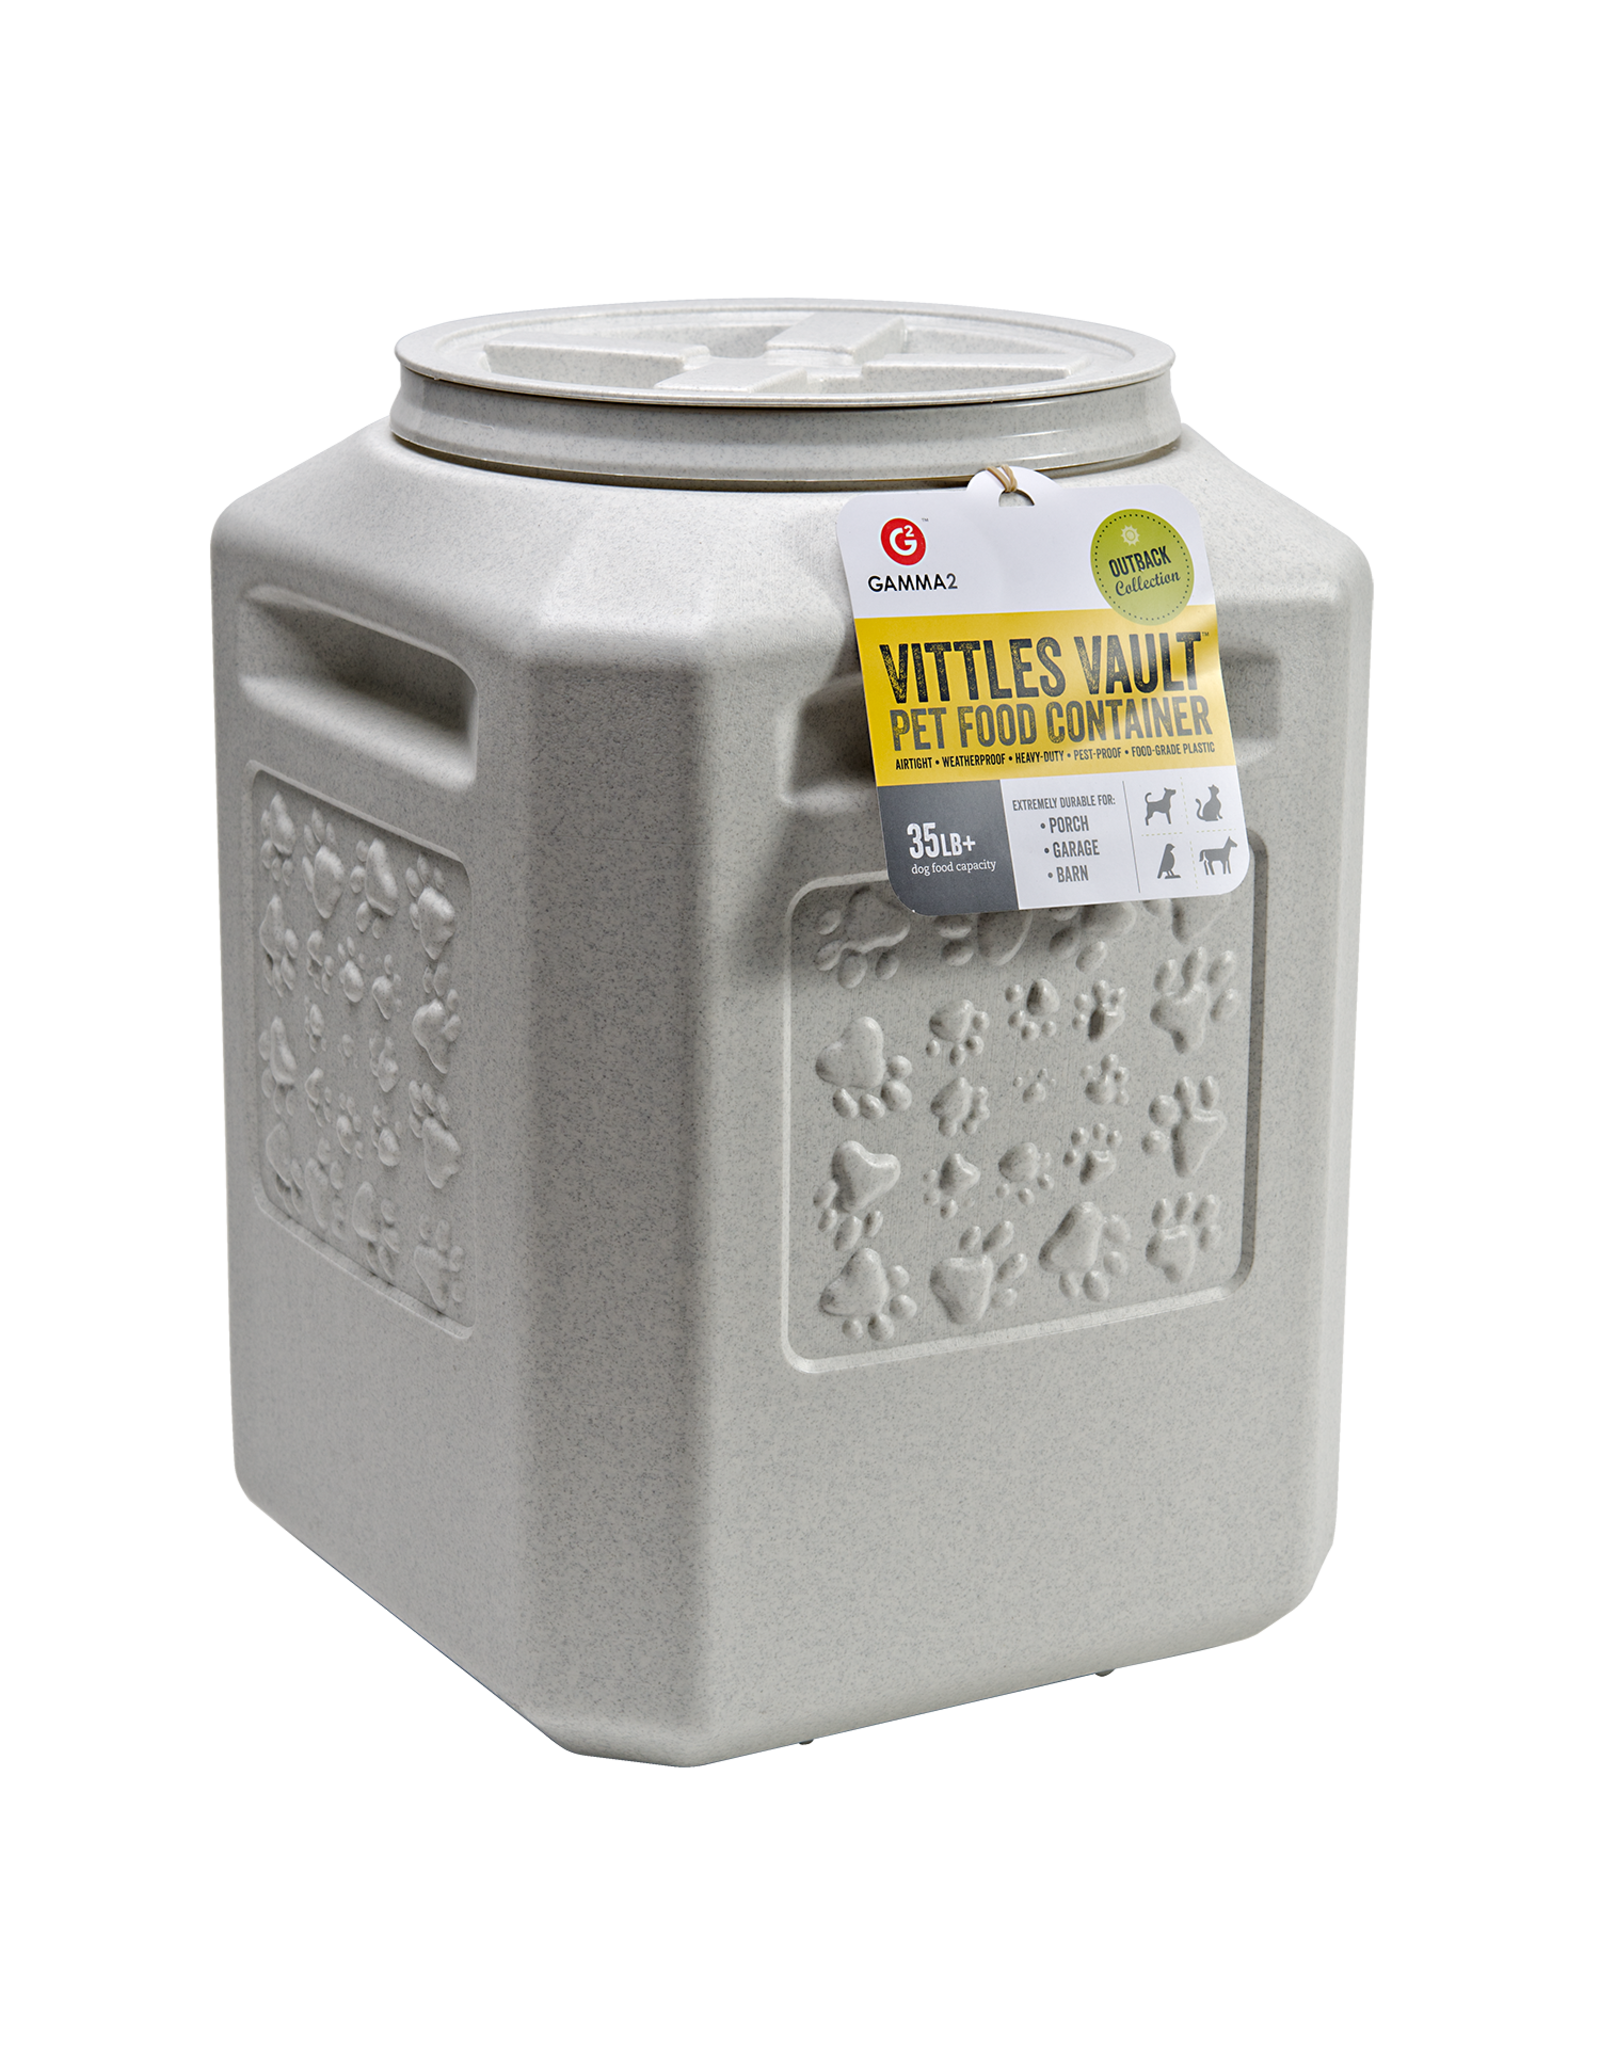 Gamma2 Vittles Vault Food Storage Container 35lb - 12x12x13.25in